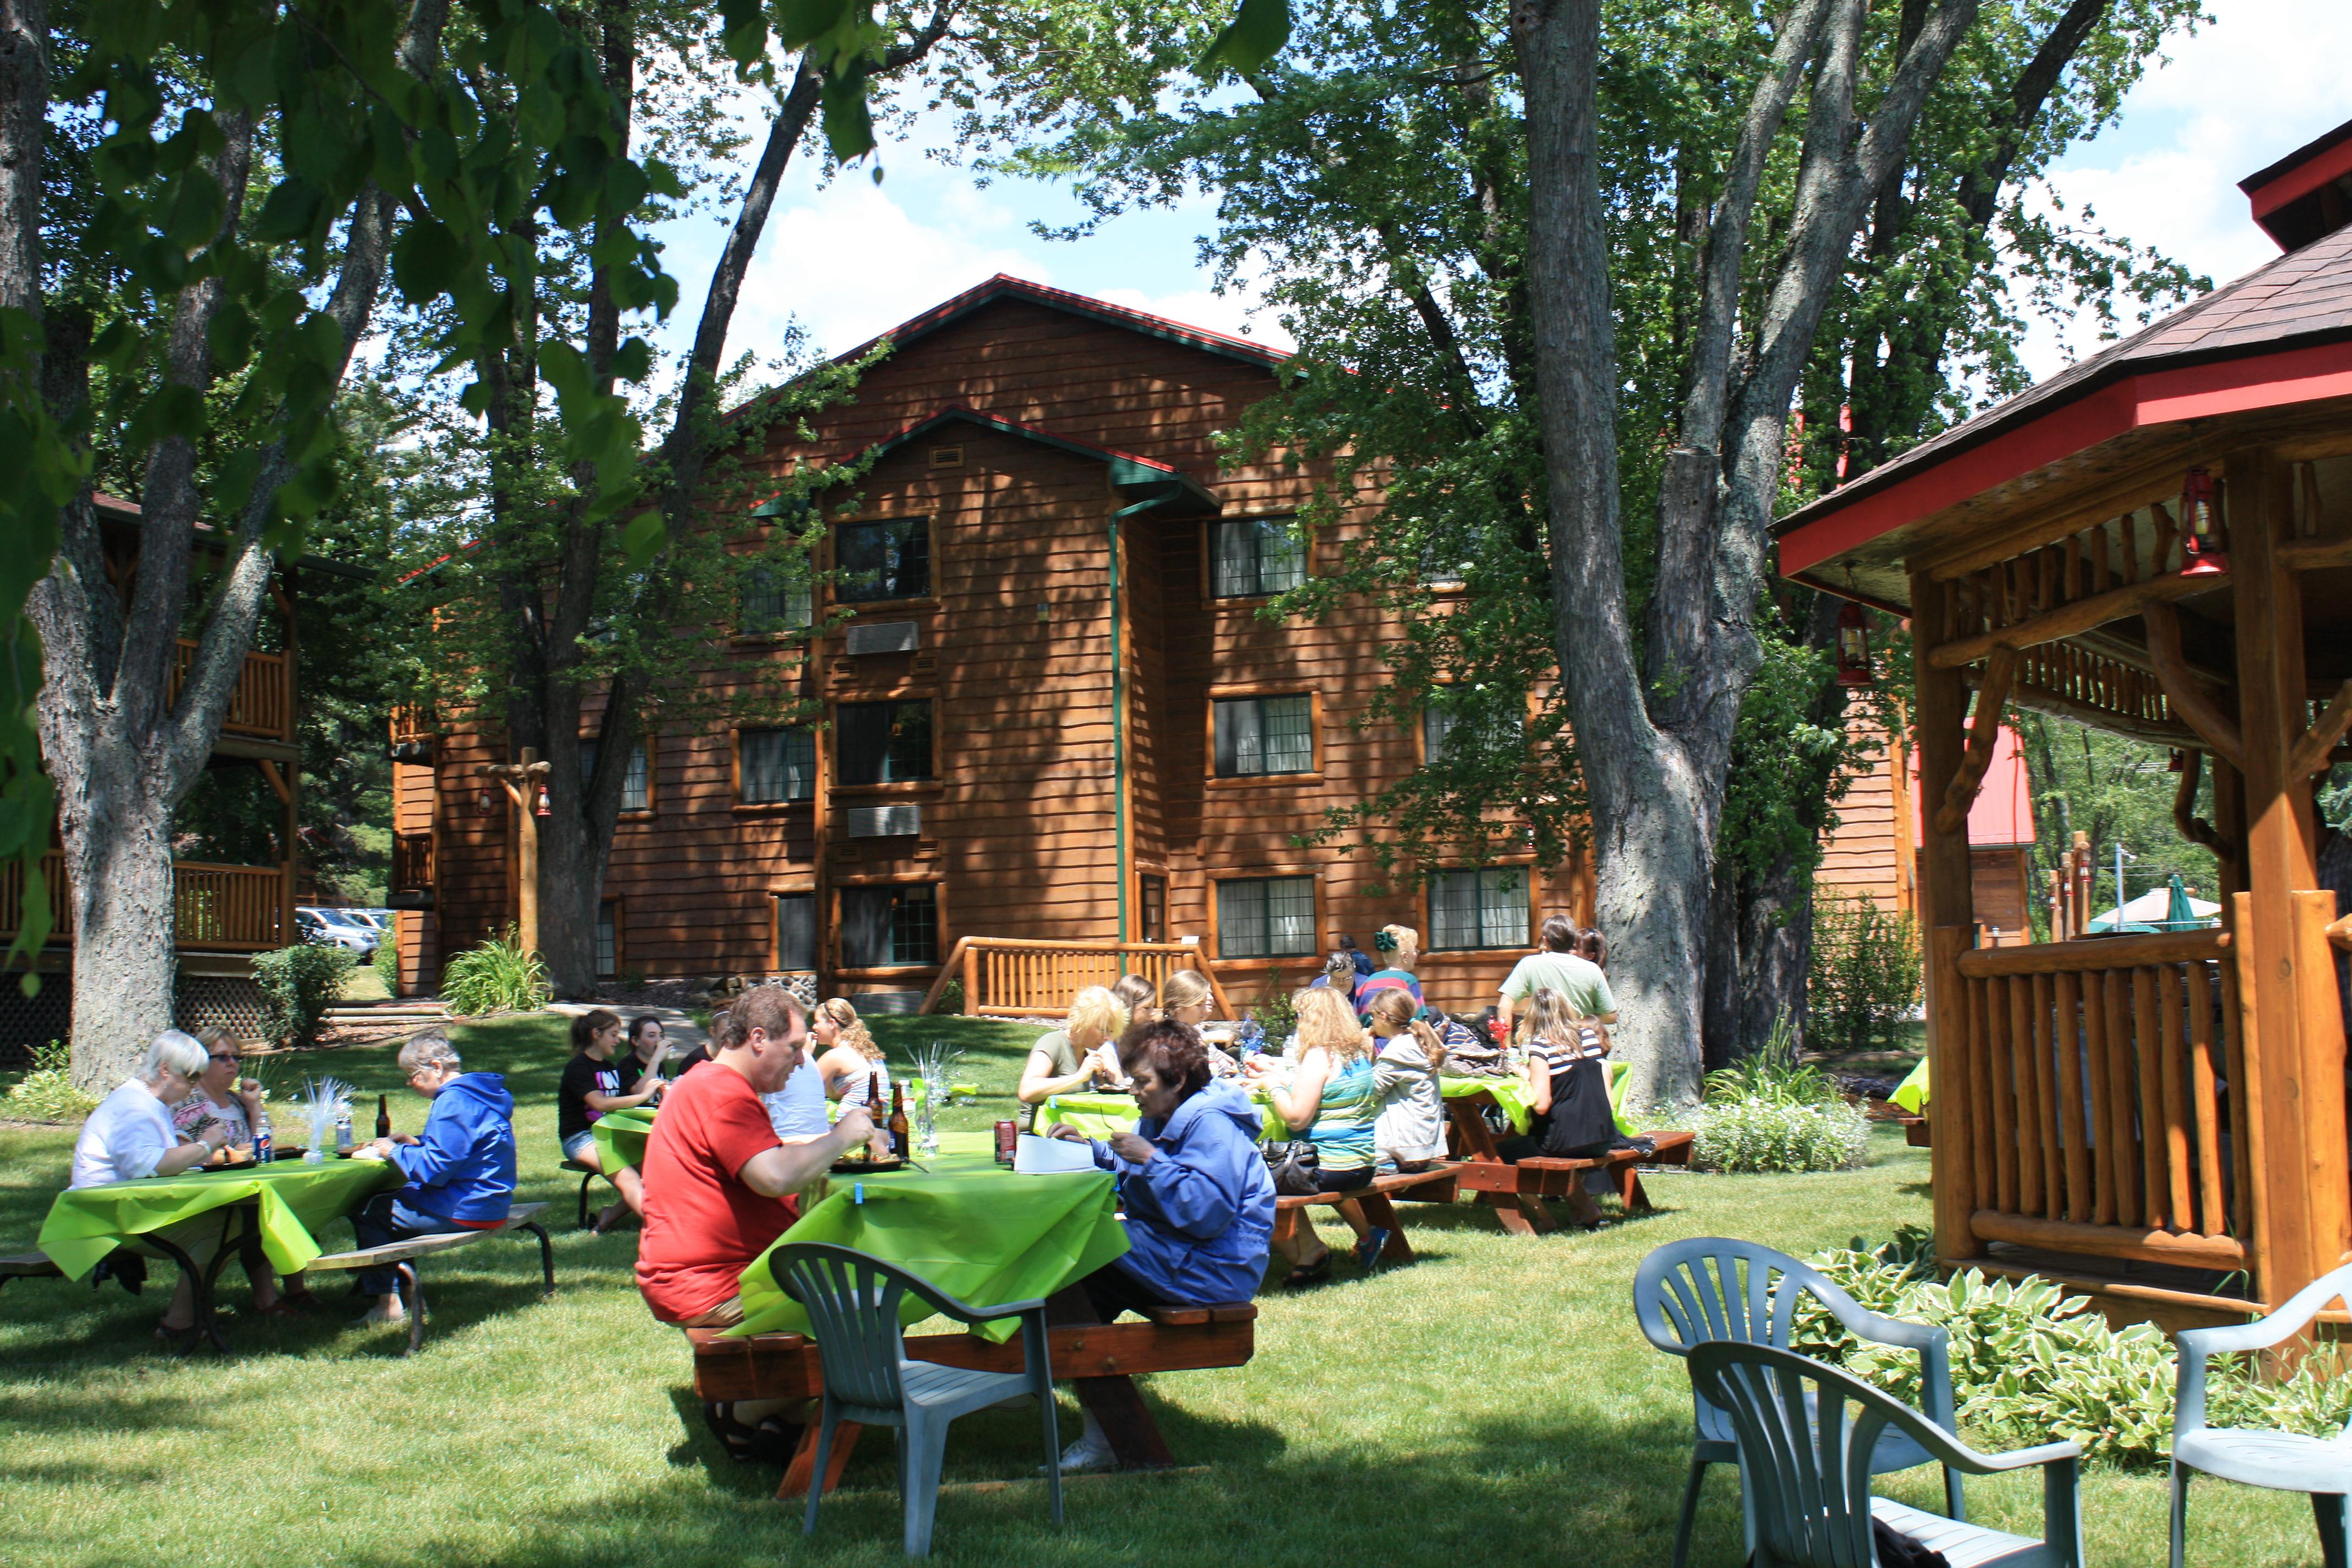 groups meetings reunions meadowbrook resort in wisconsin dells